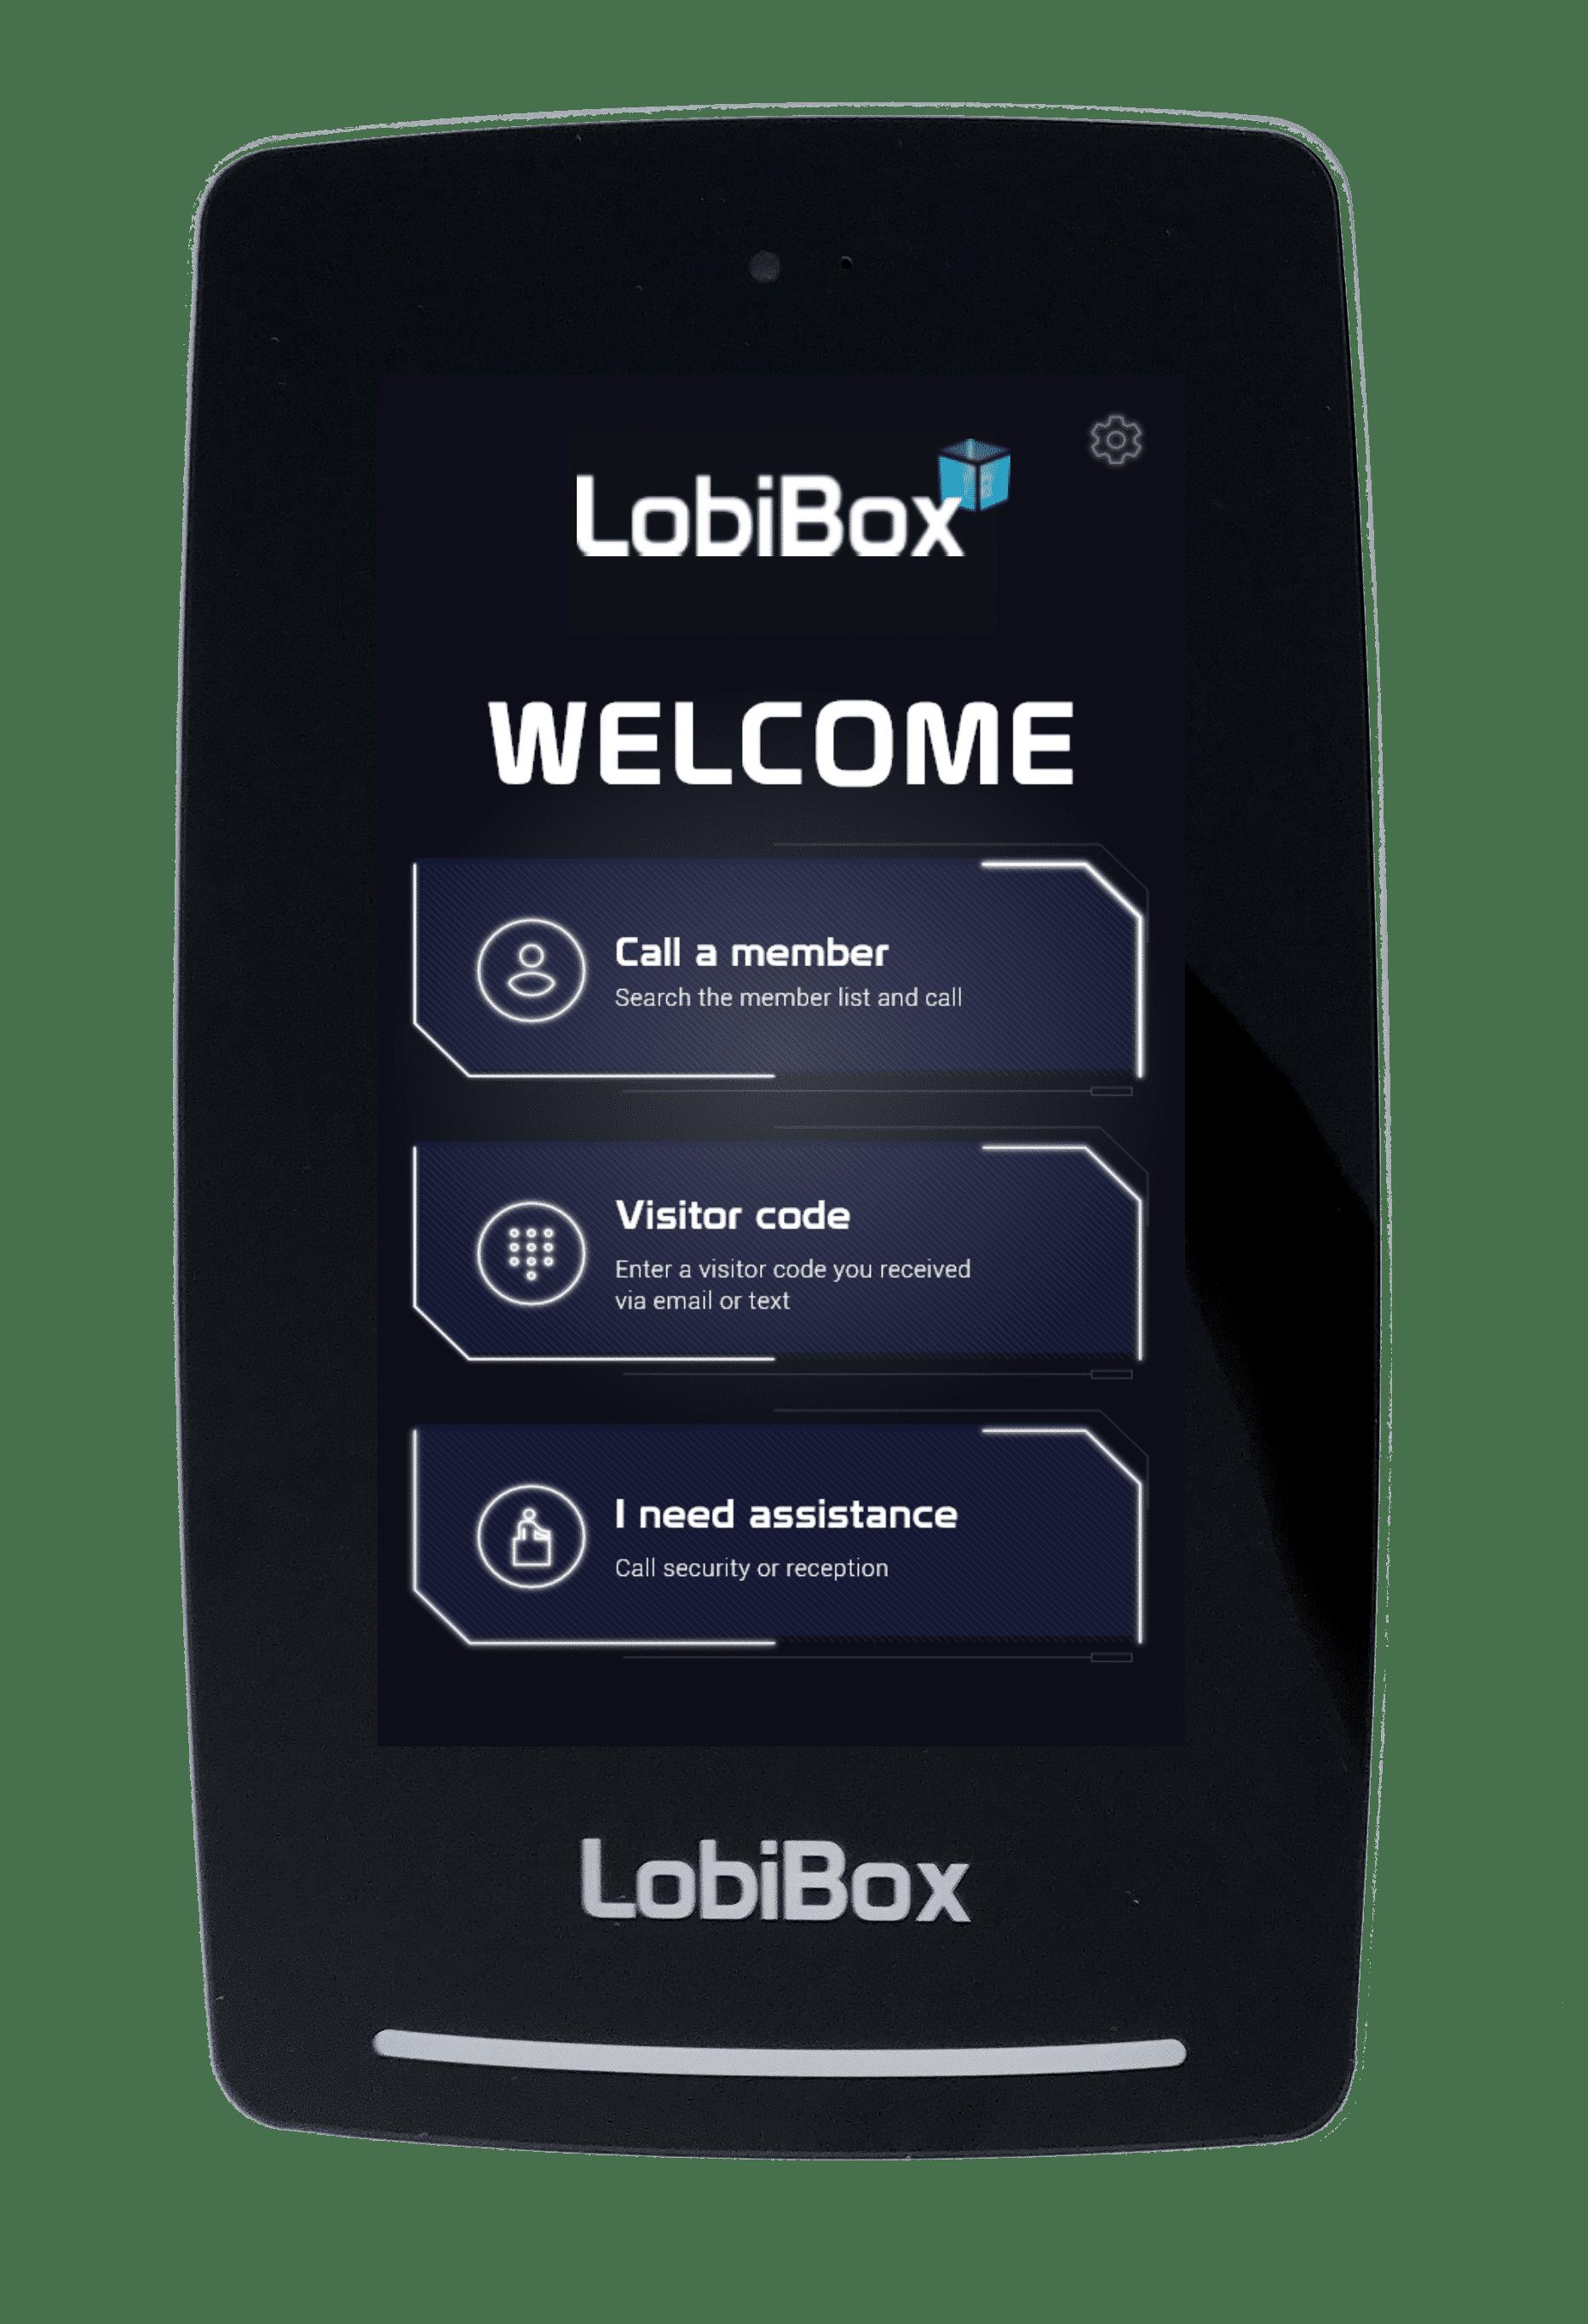 LobiBox Welcome Screen